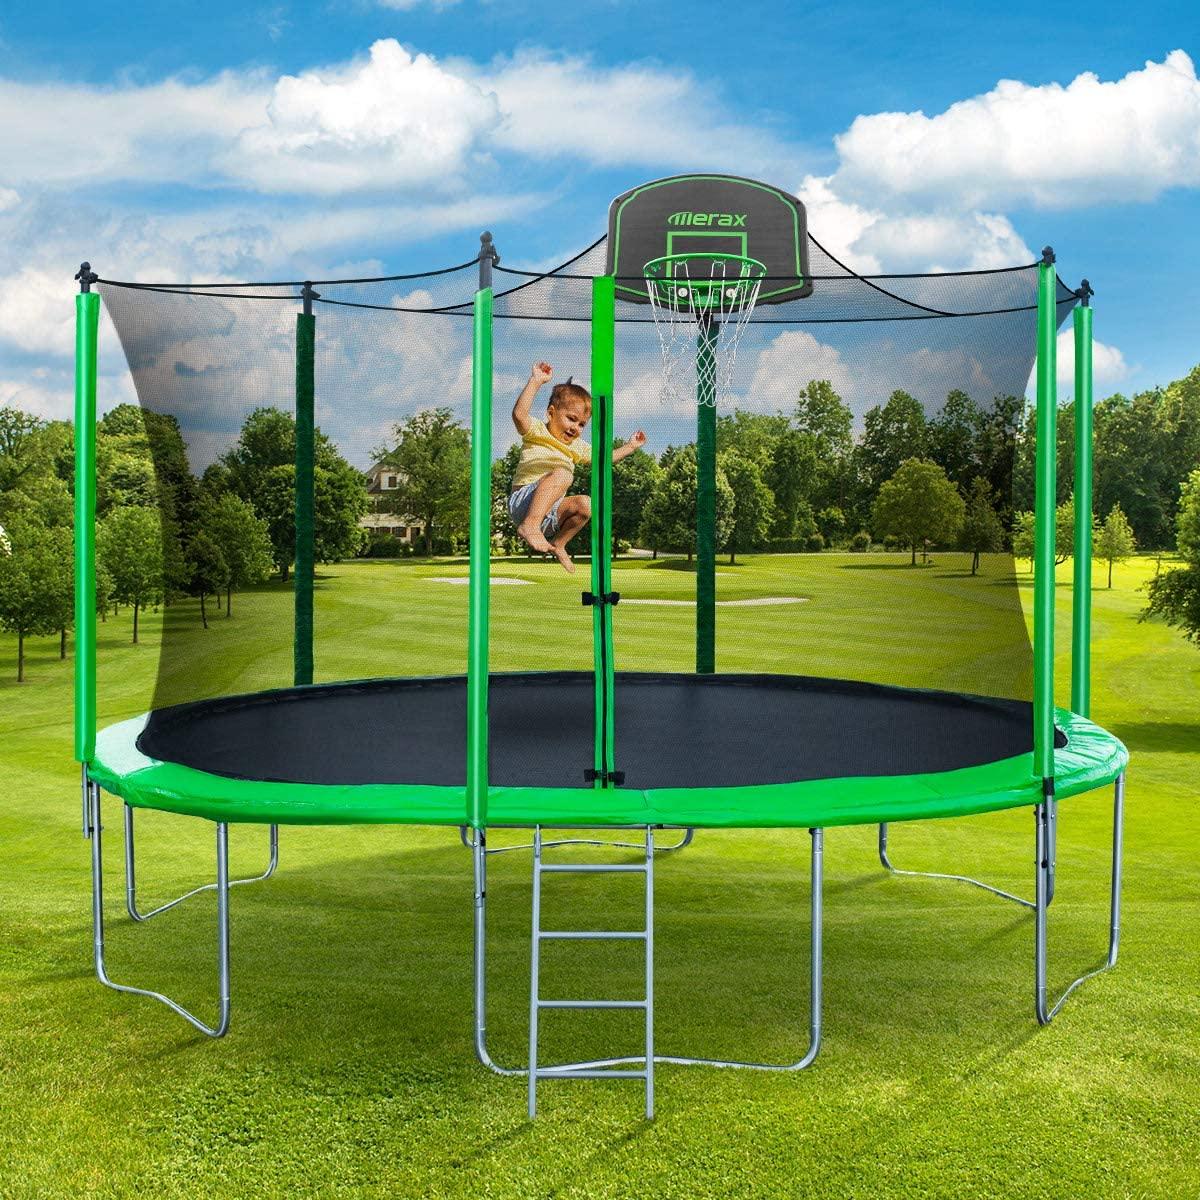 sportspower trampoline review